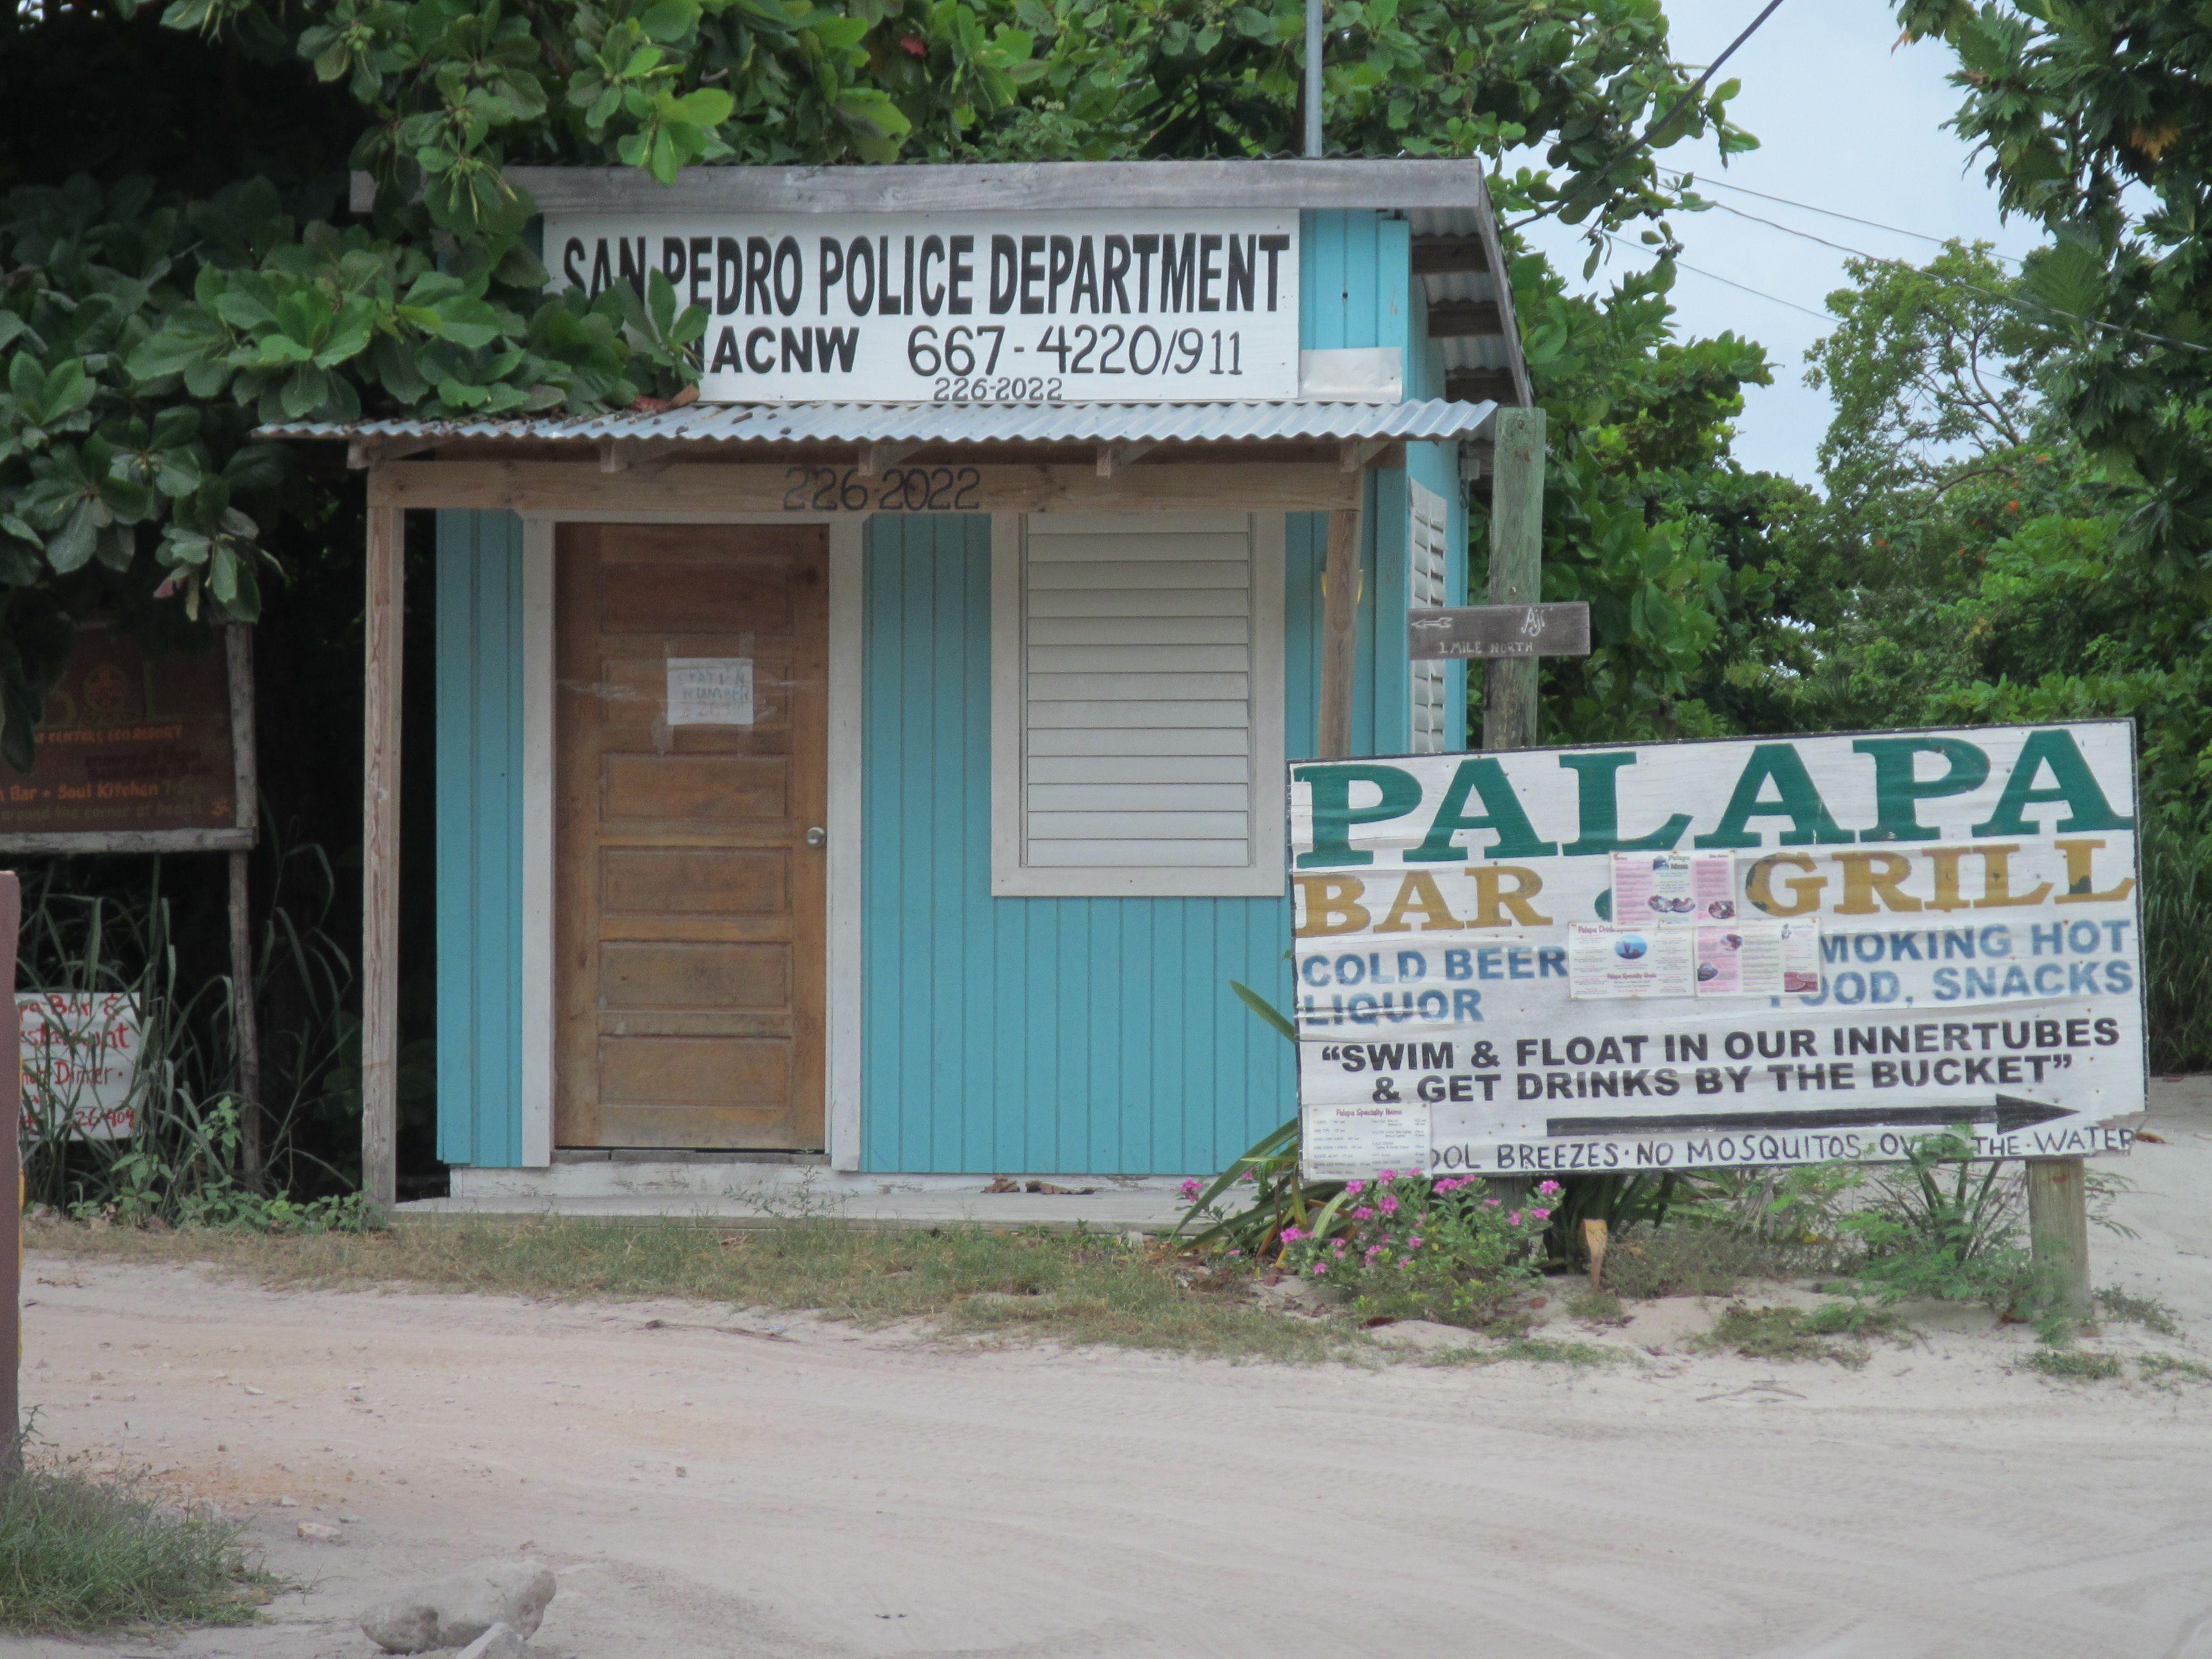 San Pedro police department.